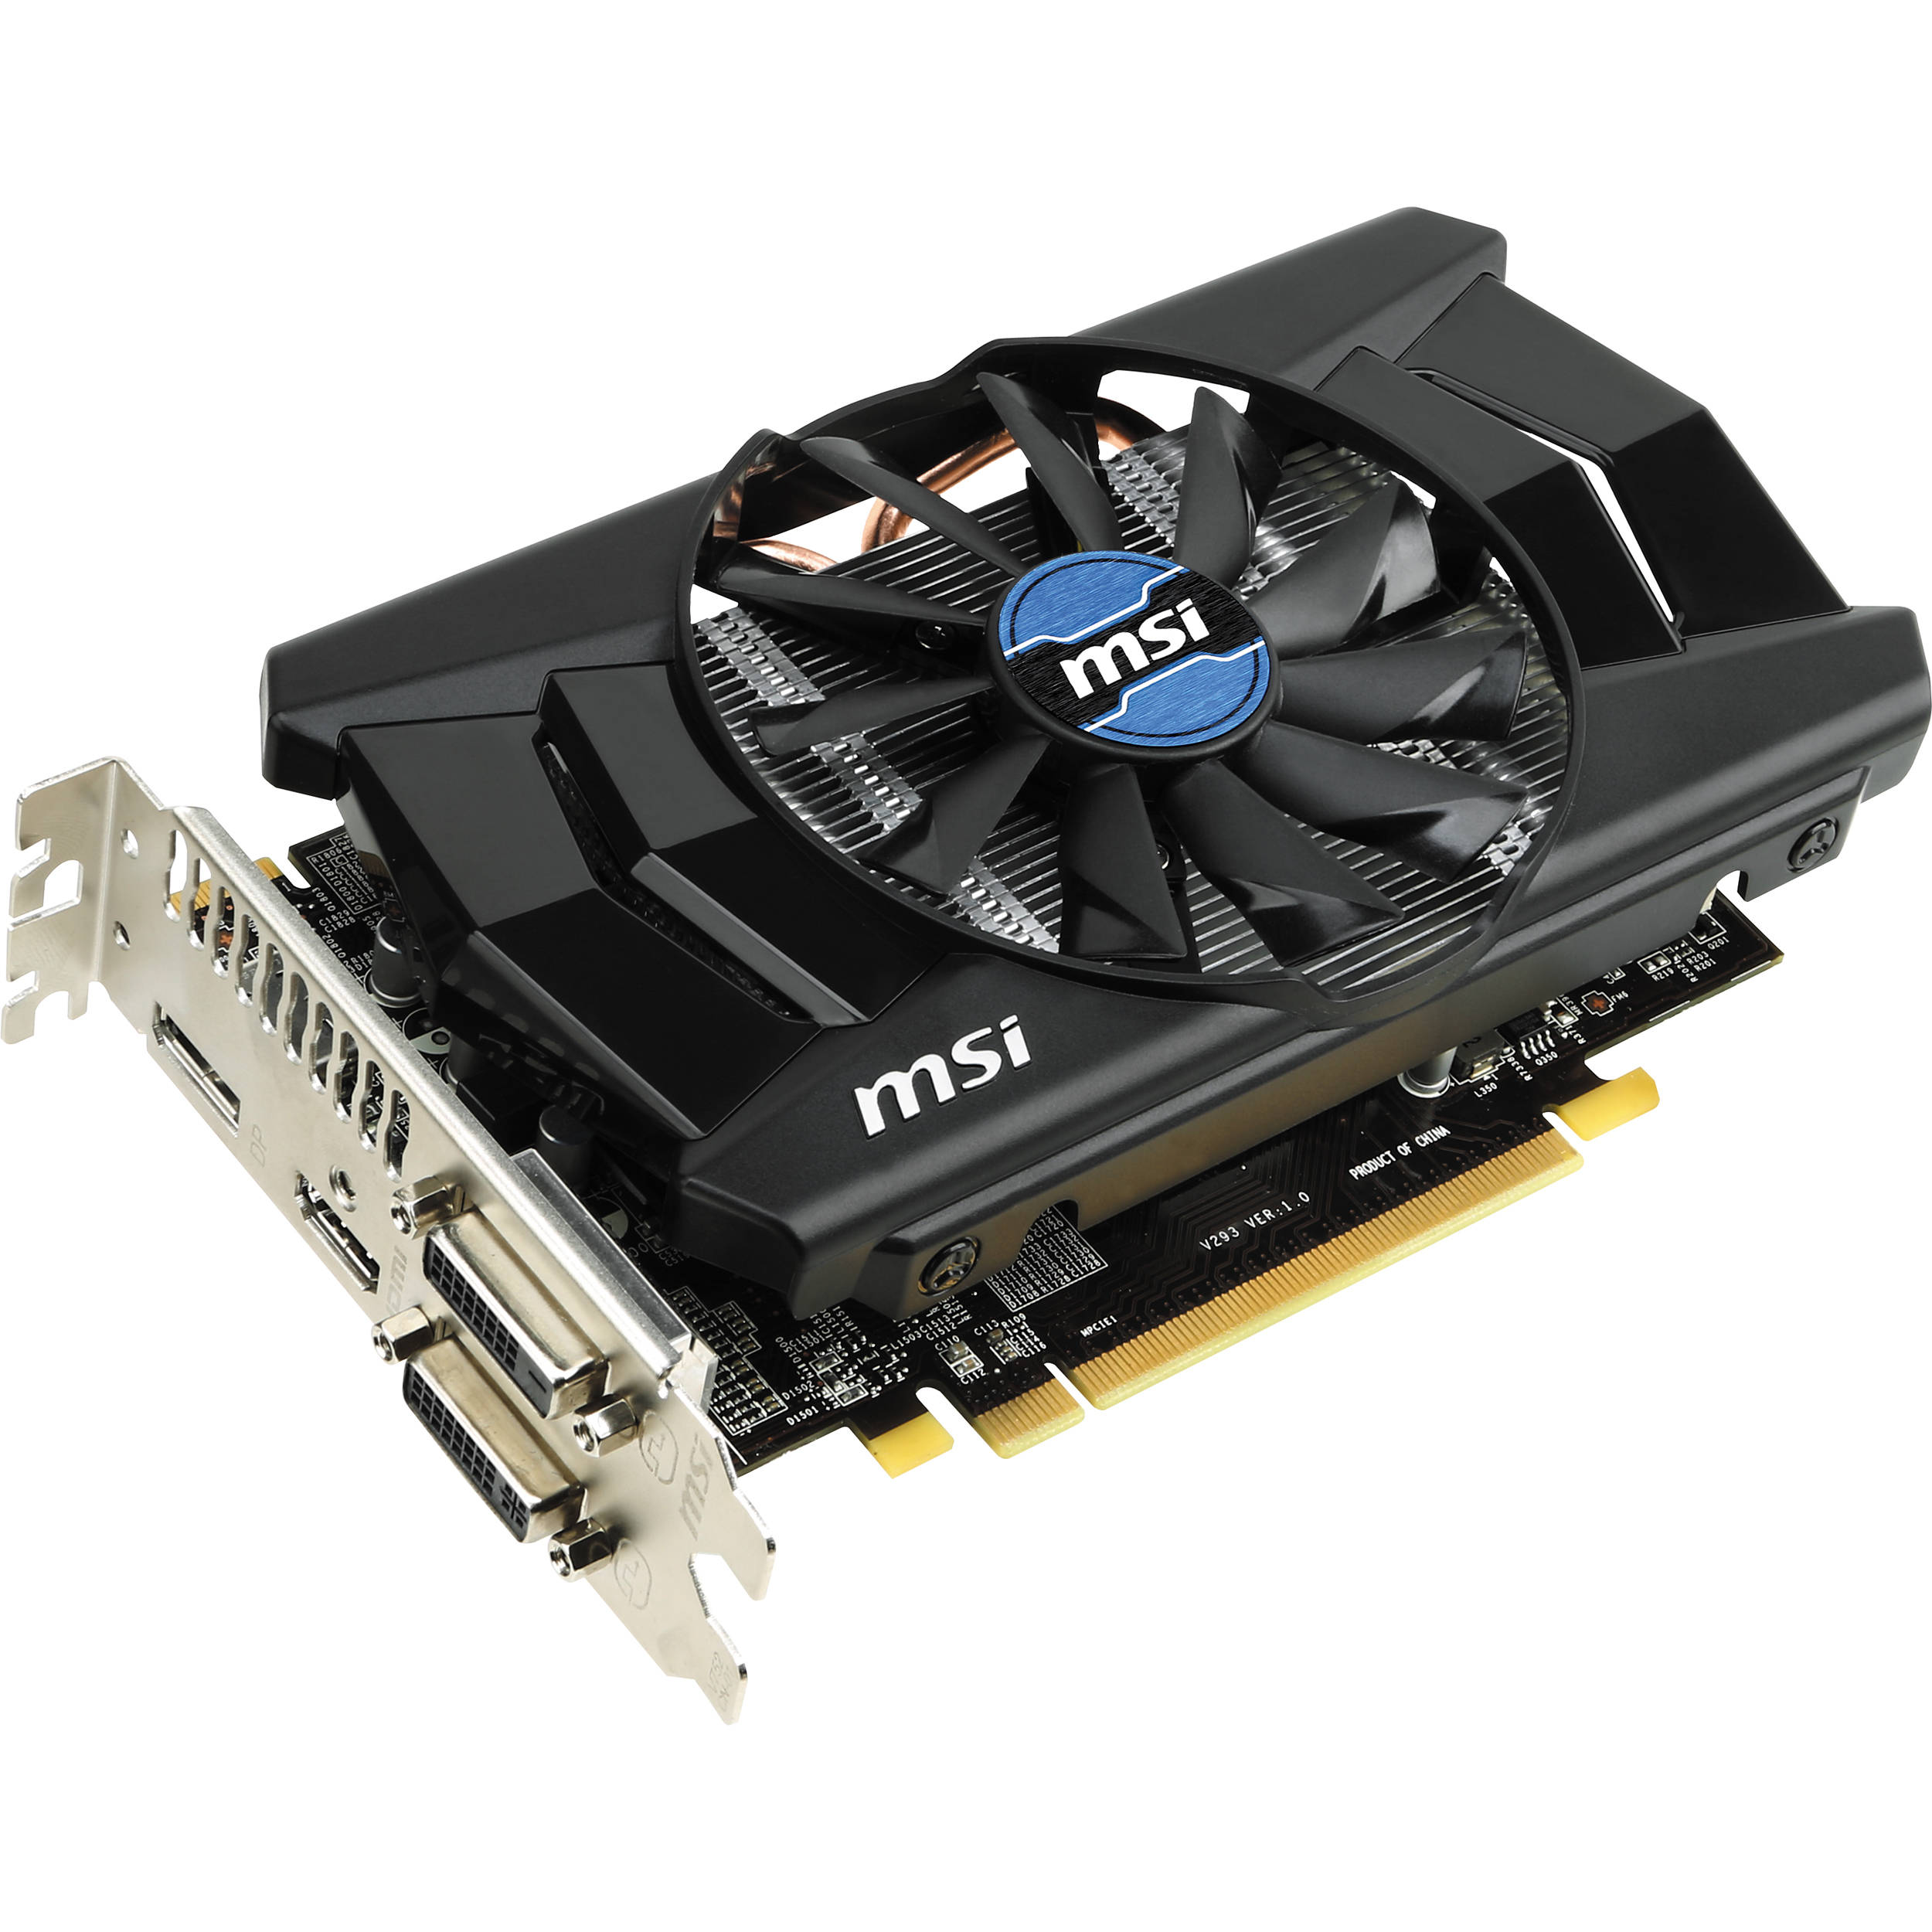 MSI Radeon R7 260X Graphics Card